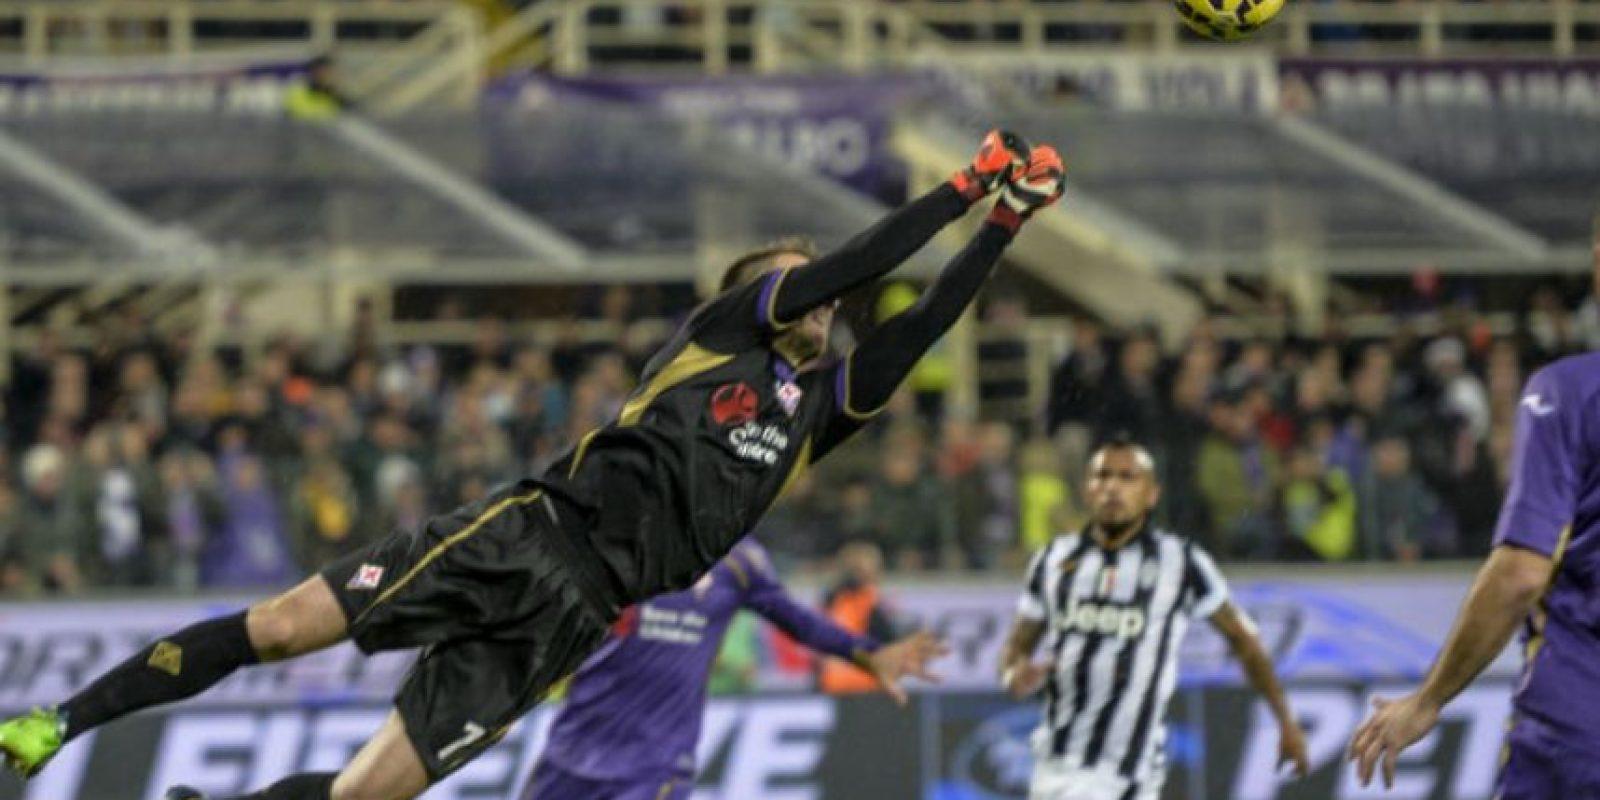 El portero de la Fiorentina despeja un remate de Paul Pogba. Foto:AFP